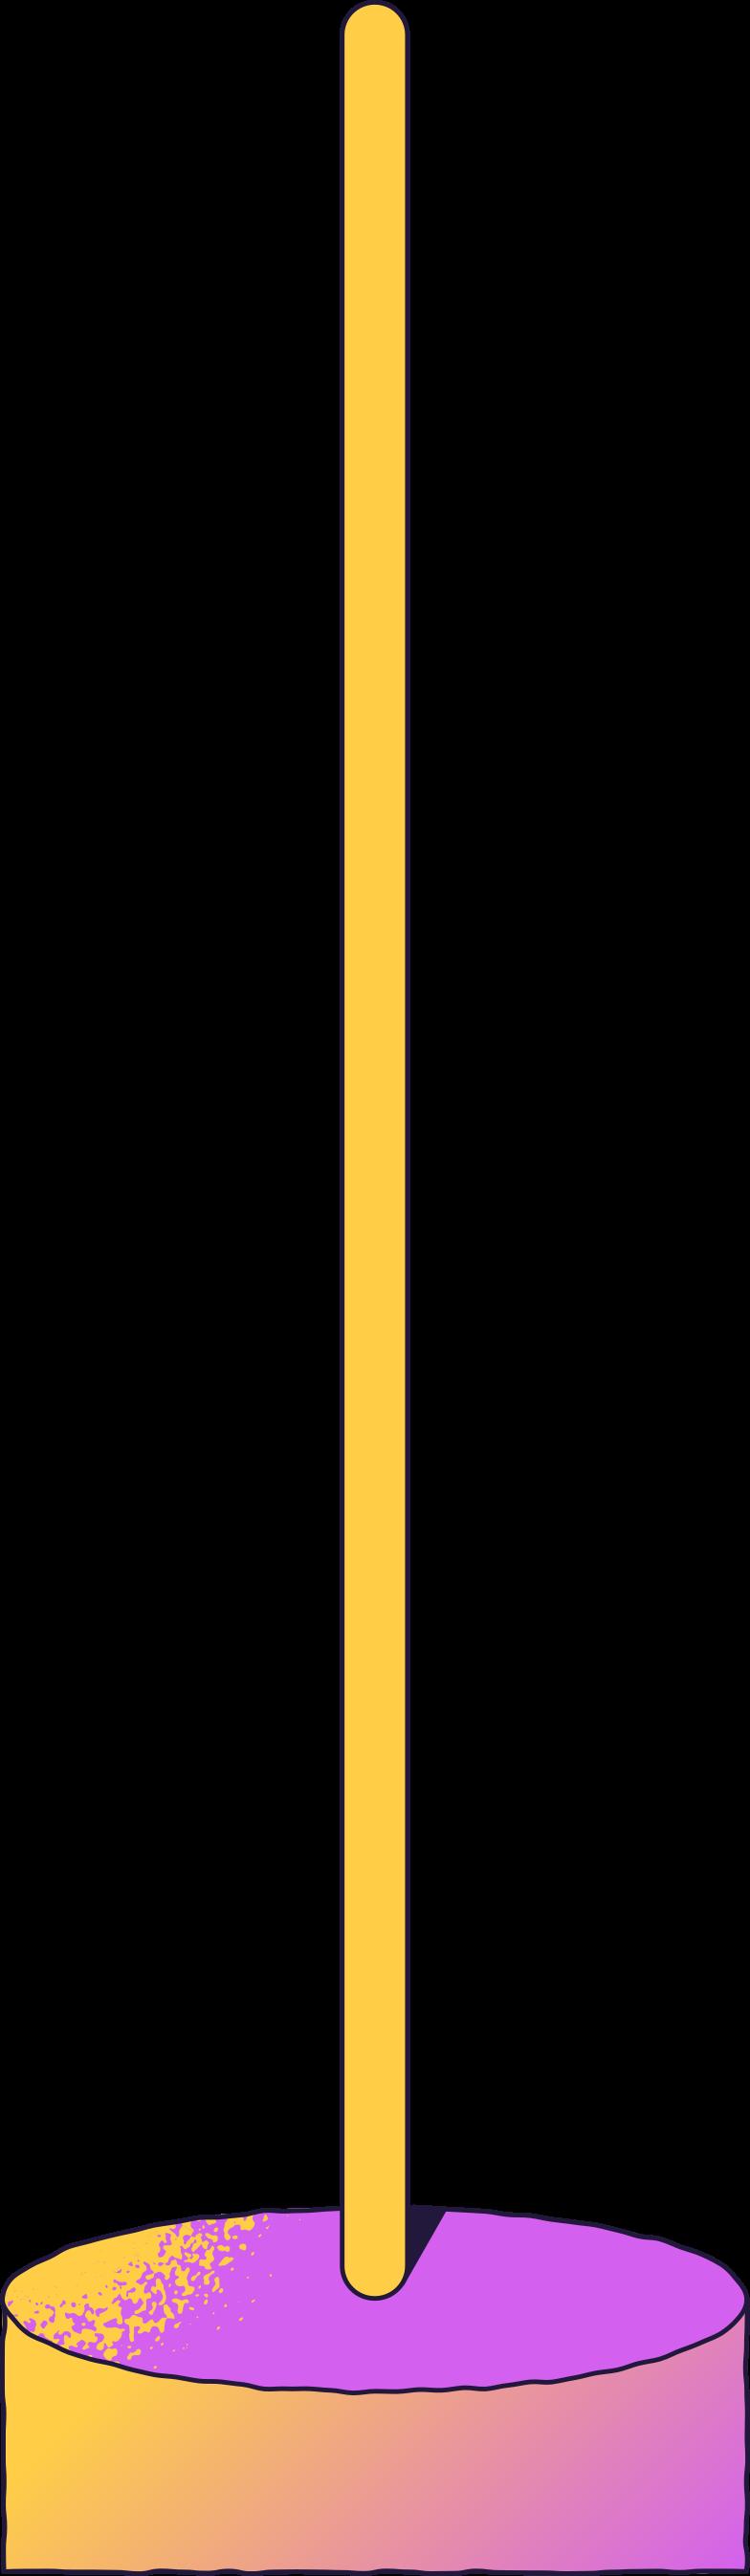 dancing pole Clipart illustration in PNG, SVG